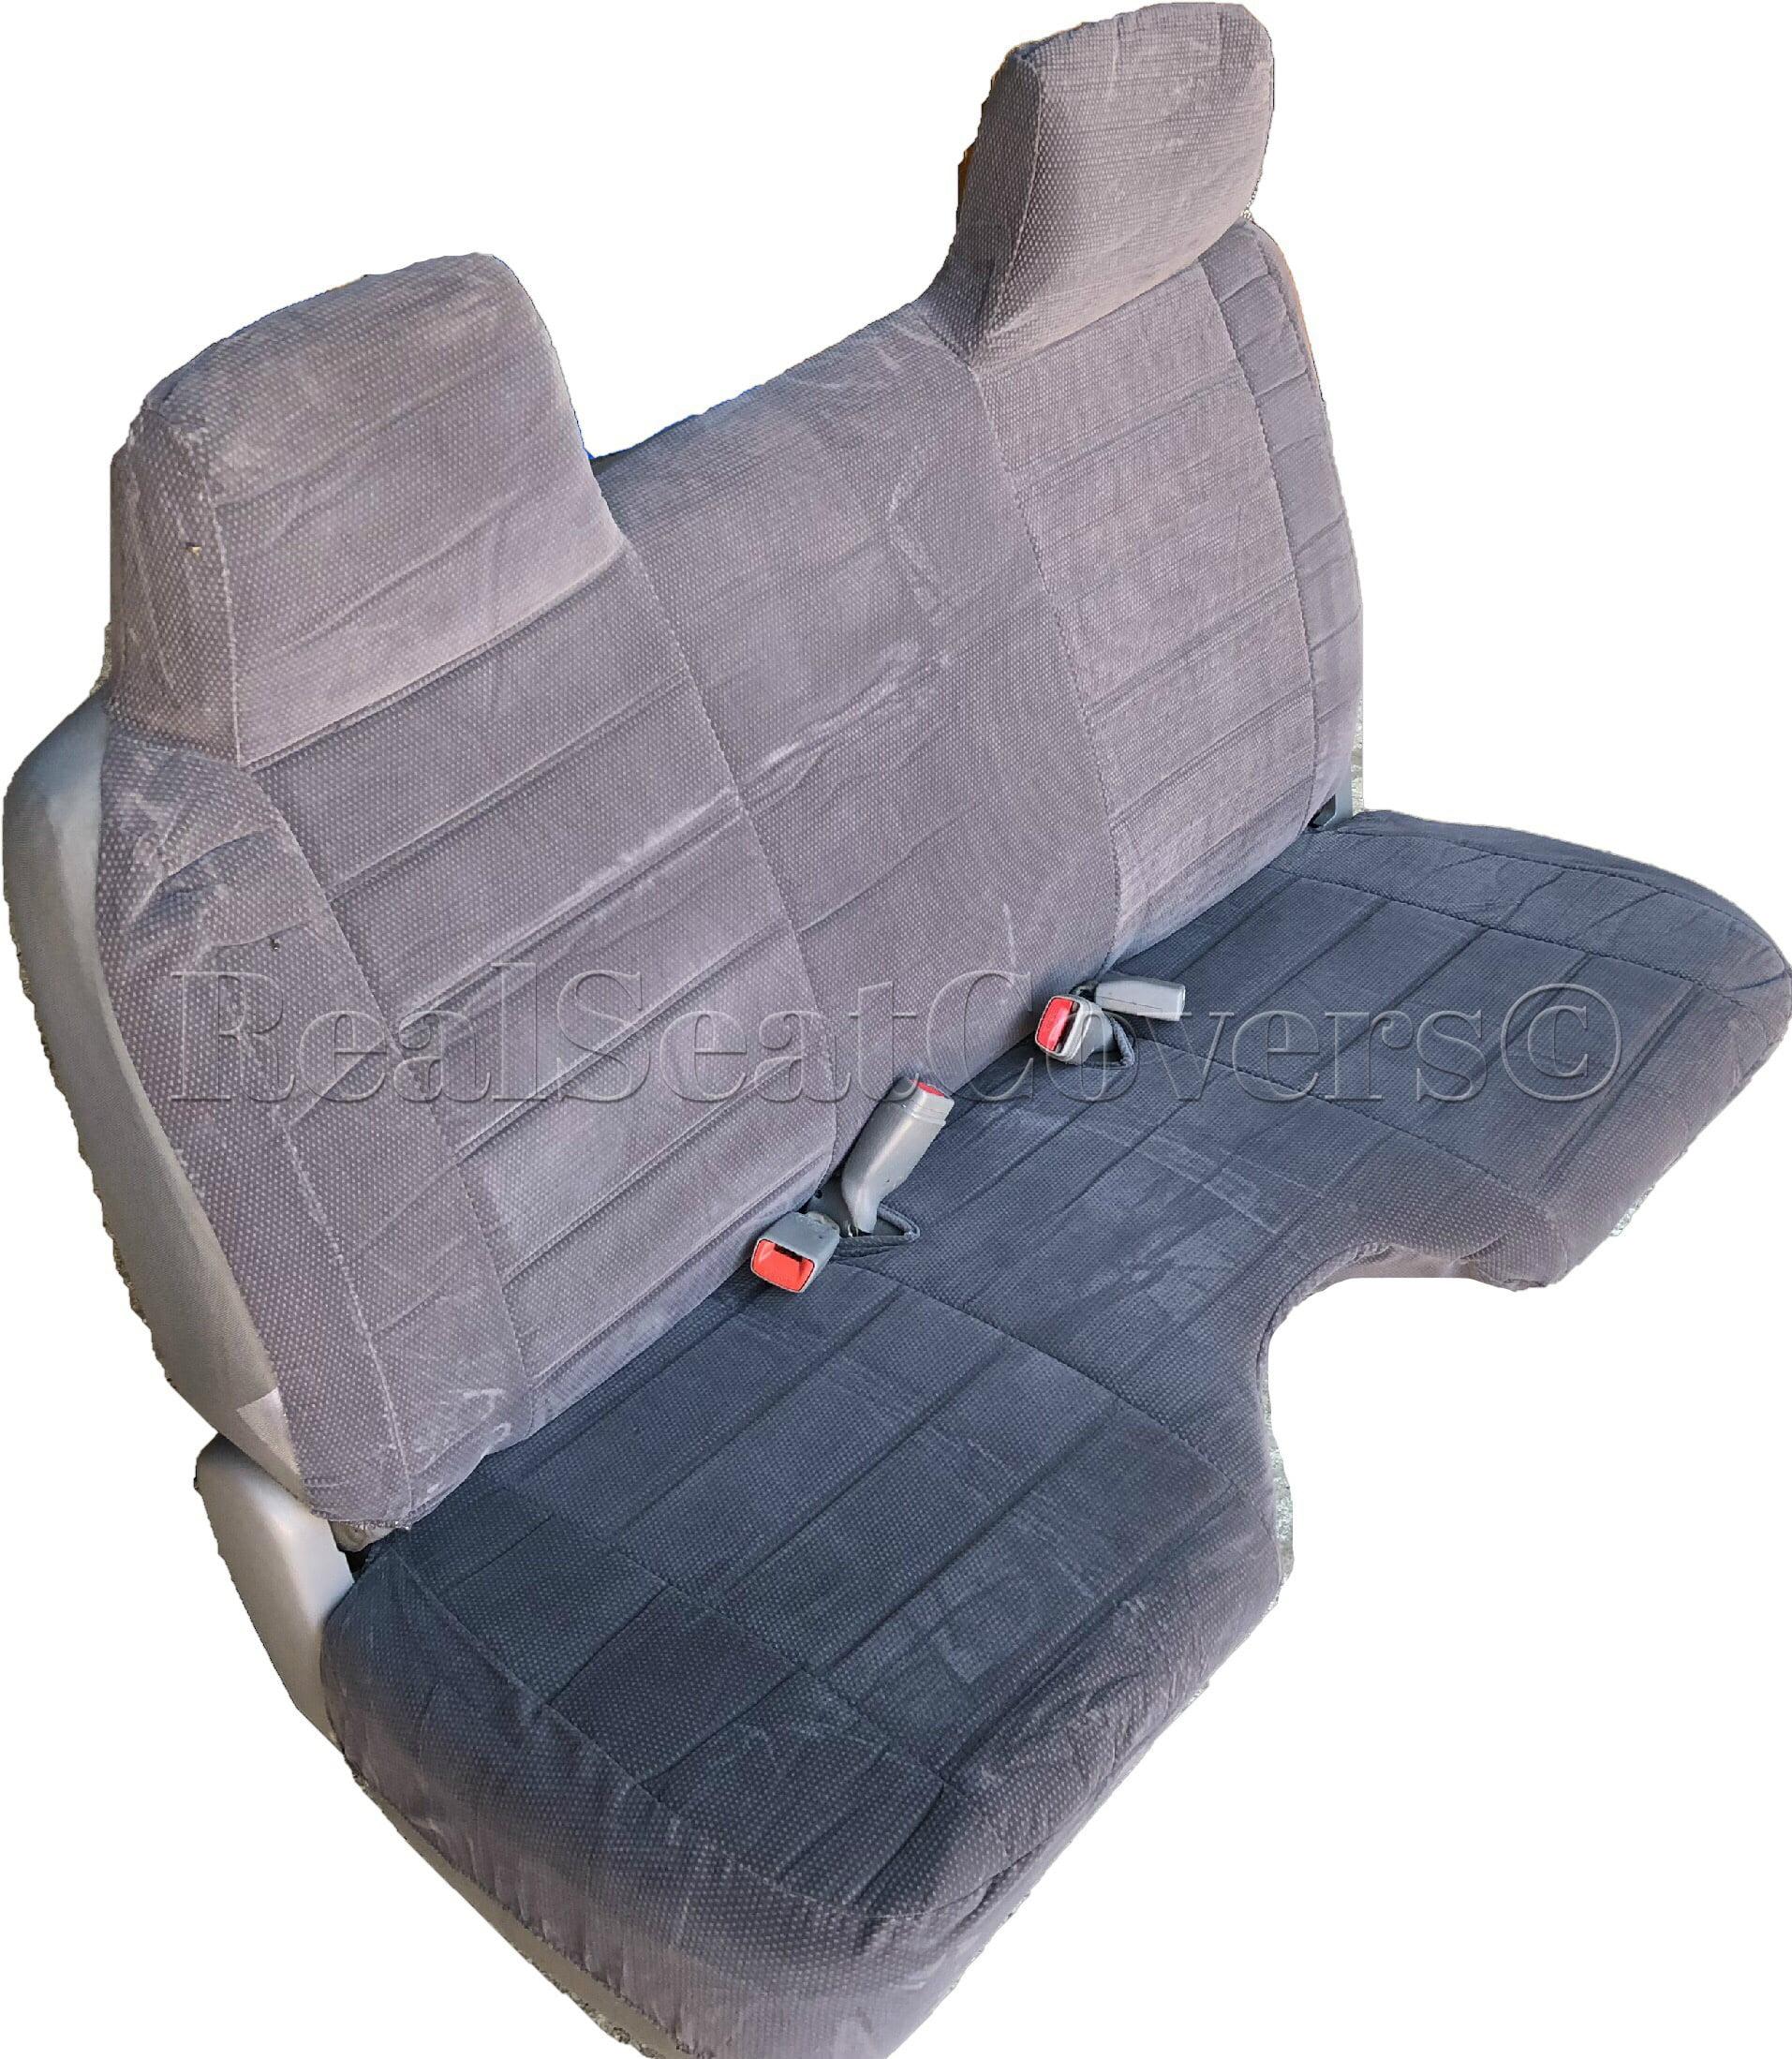 Rsc Us Automotive Grade A27 Toyota Pickup Bench Seat